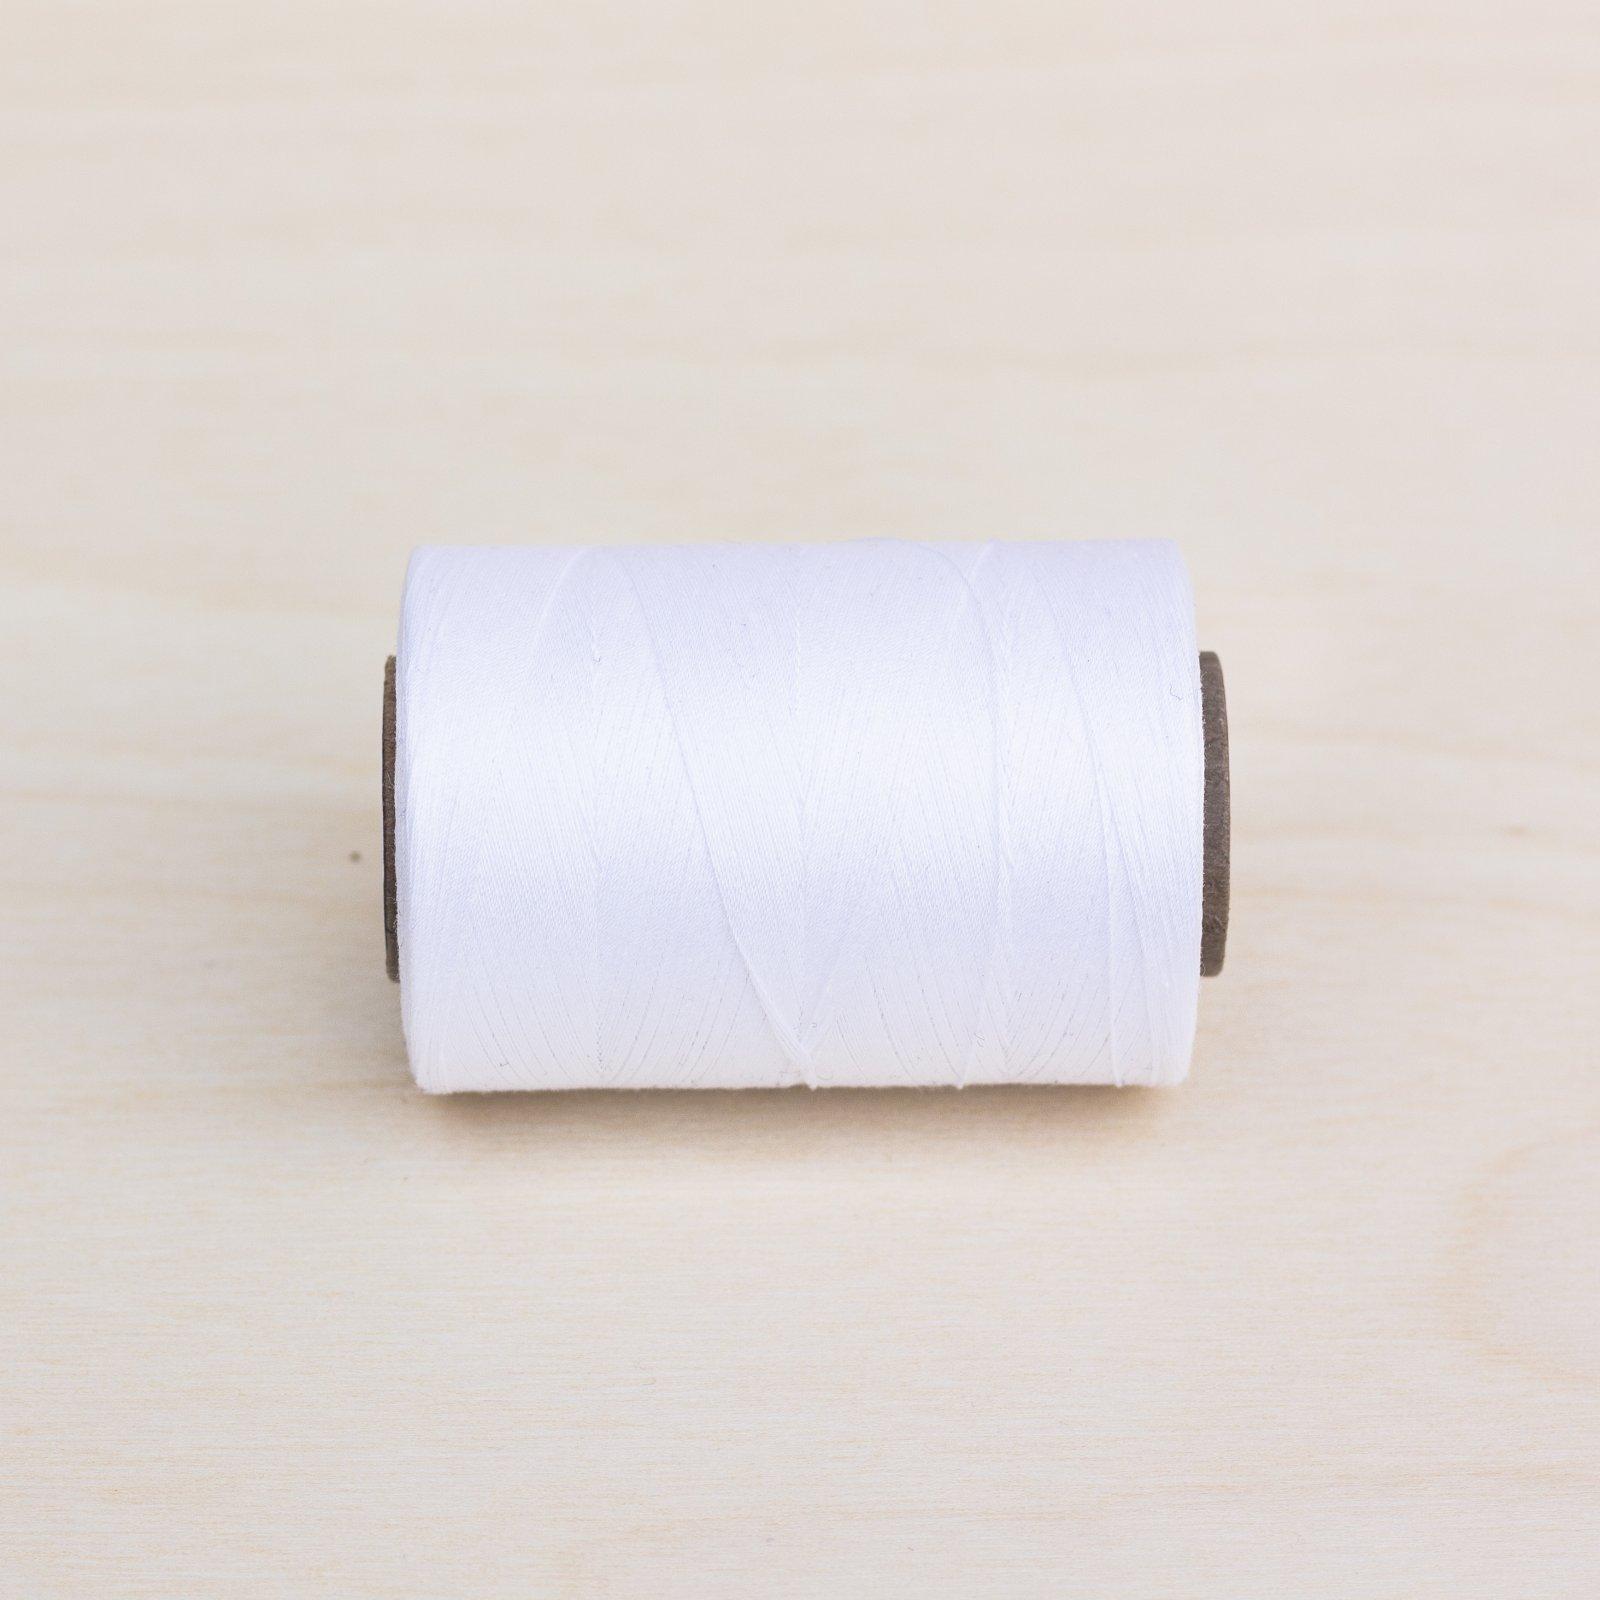 01 - White Quilting Thread 1200yd